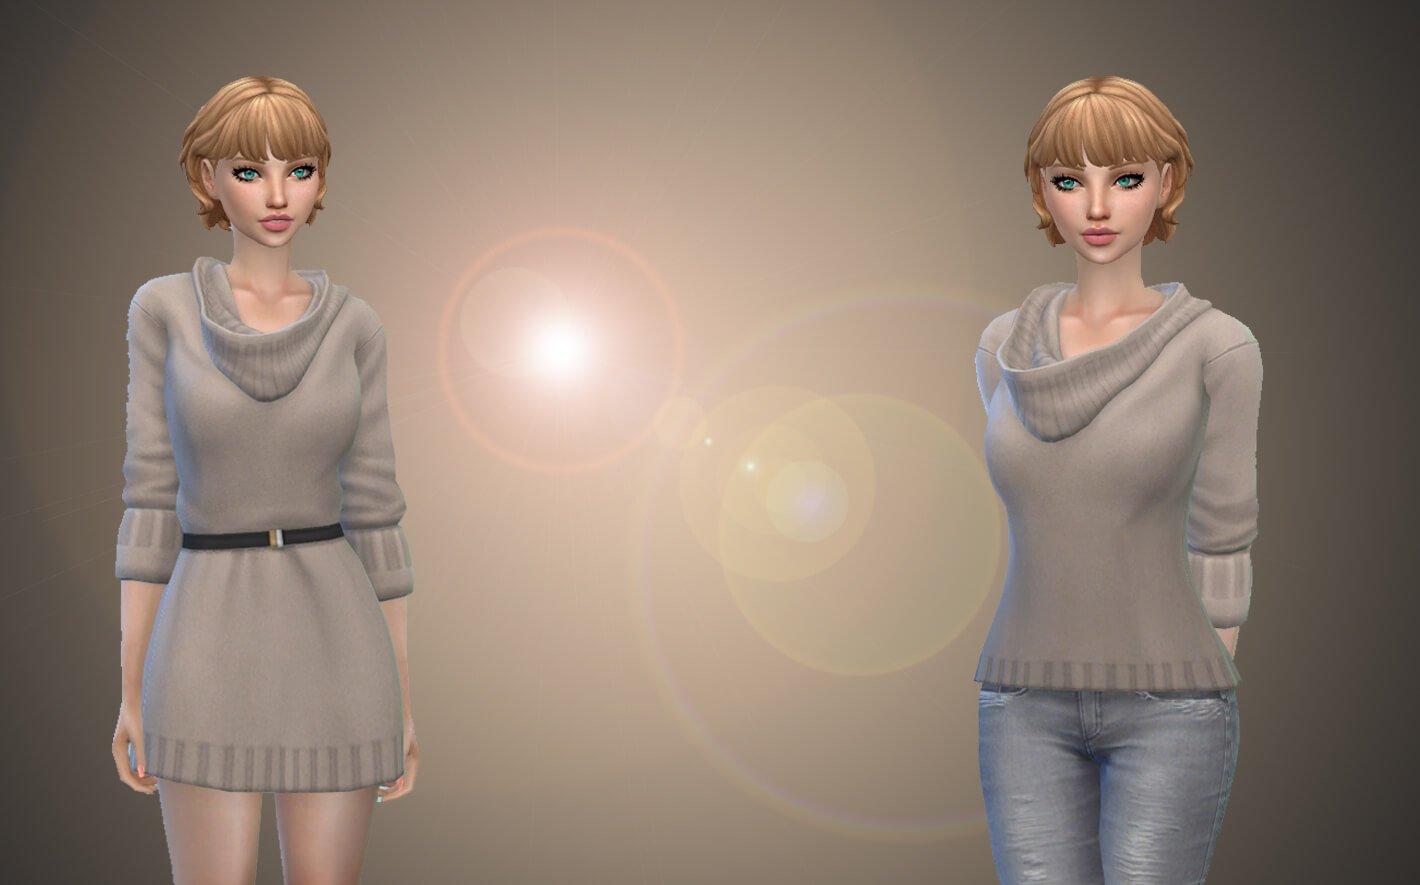 Turn Dress Into Sweater